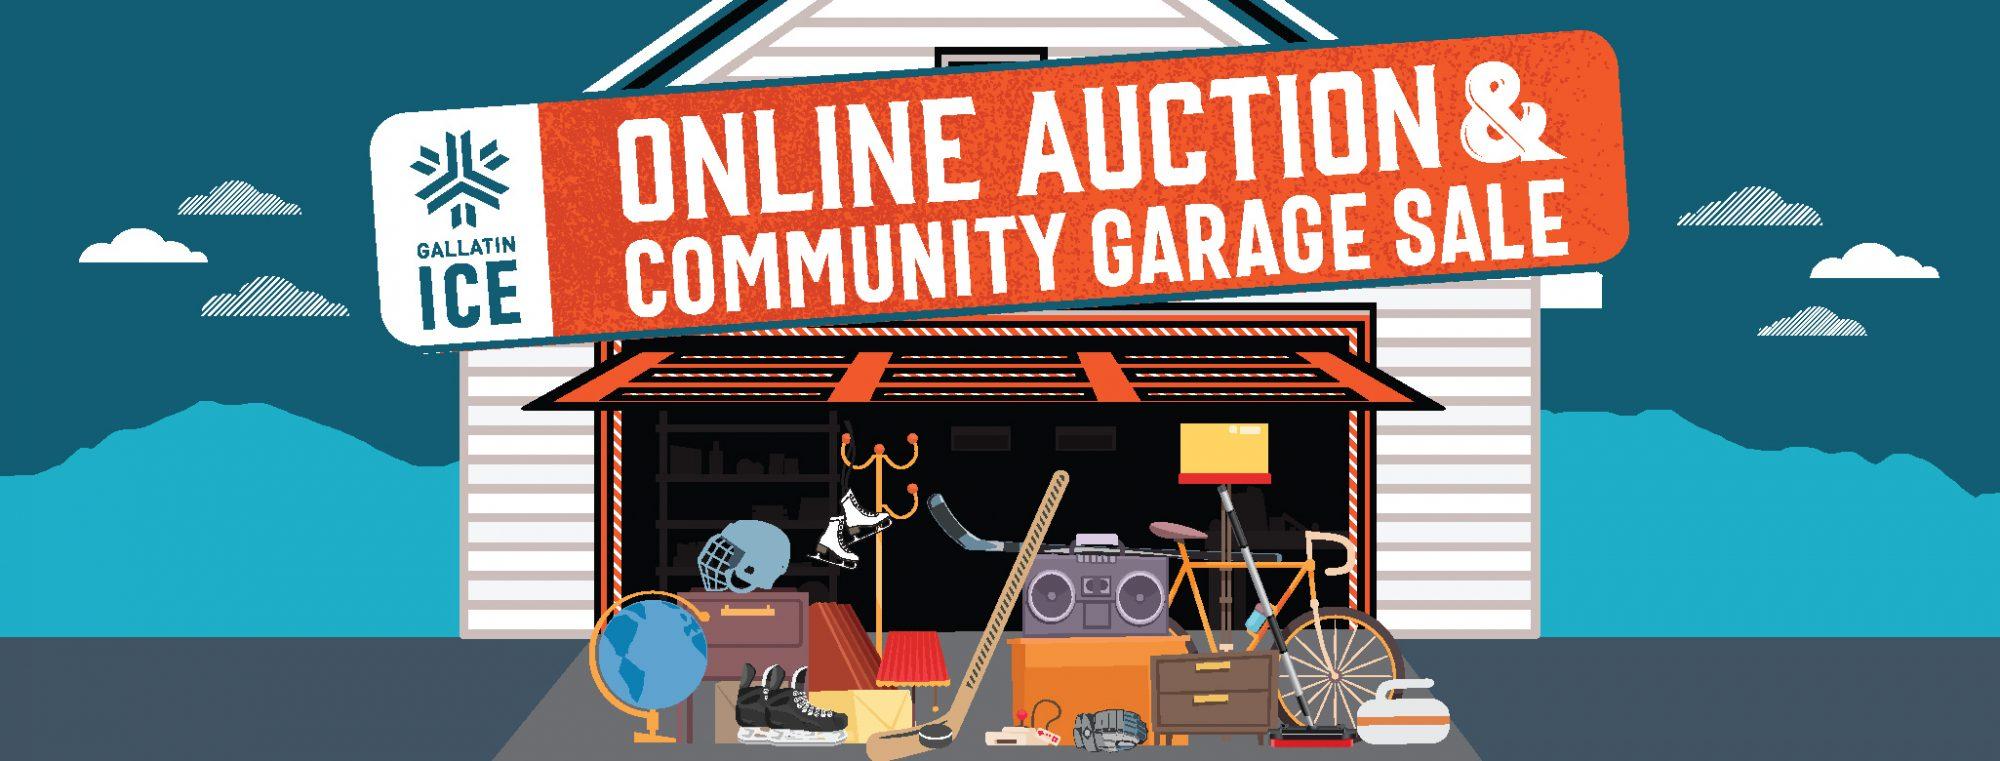 GIF Online Acution Community Garage Sale